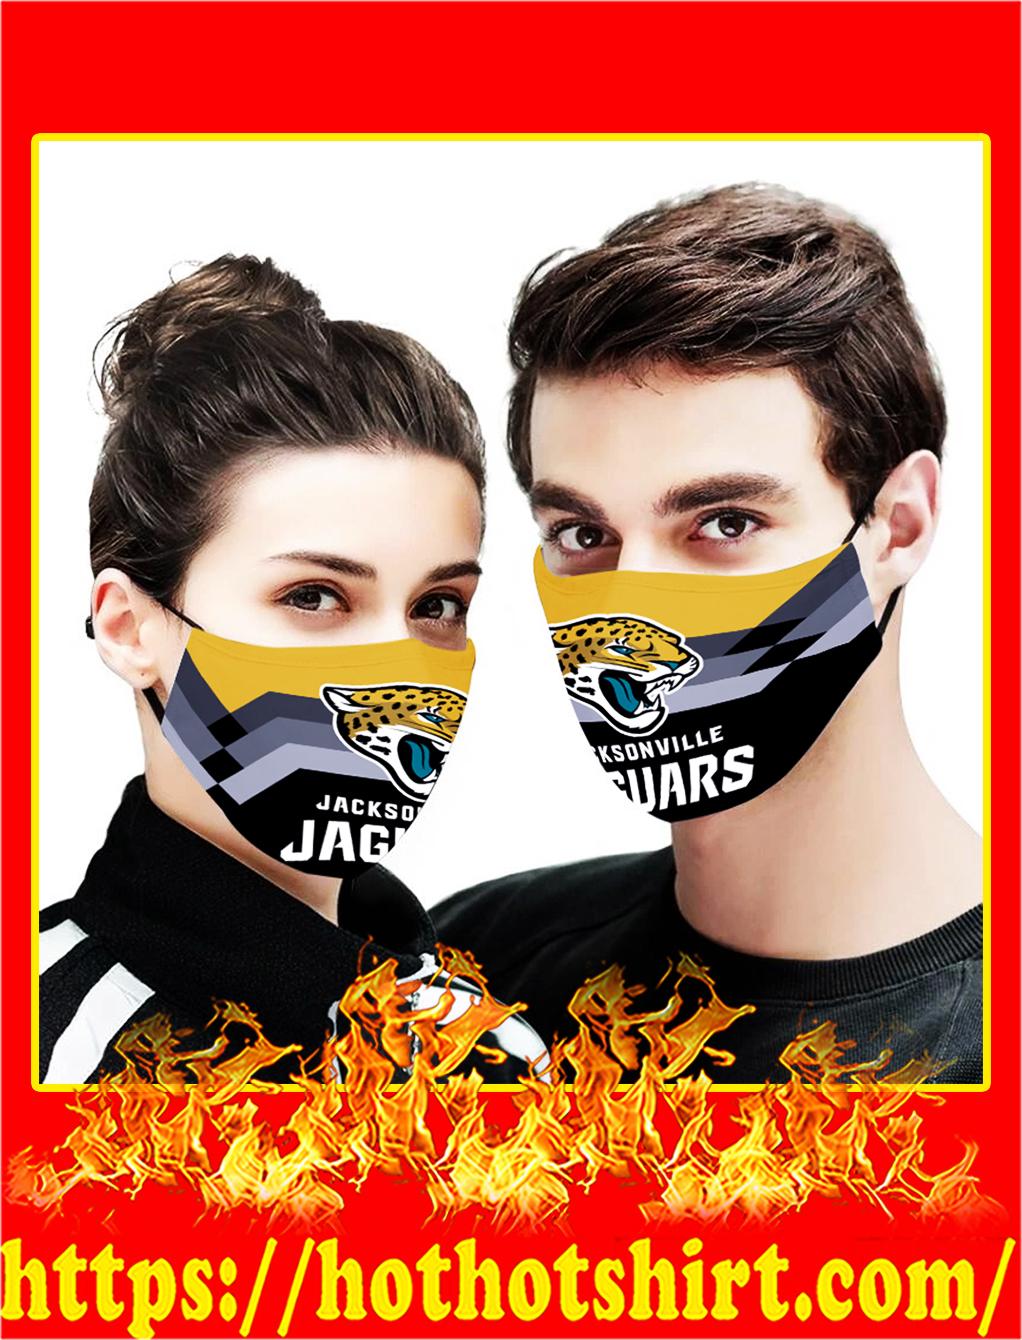 Jacksonville jaguars face mask - pic 1